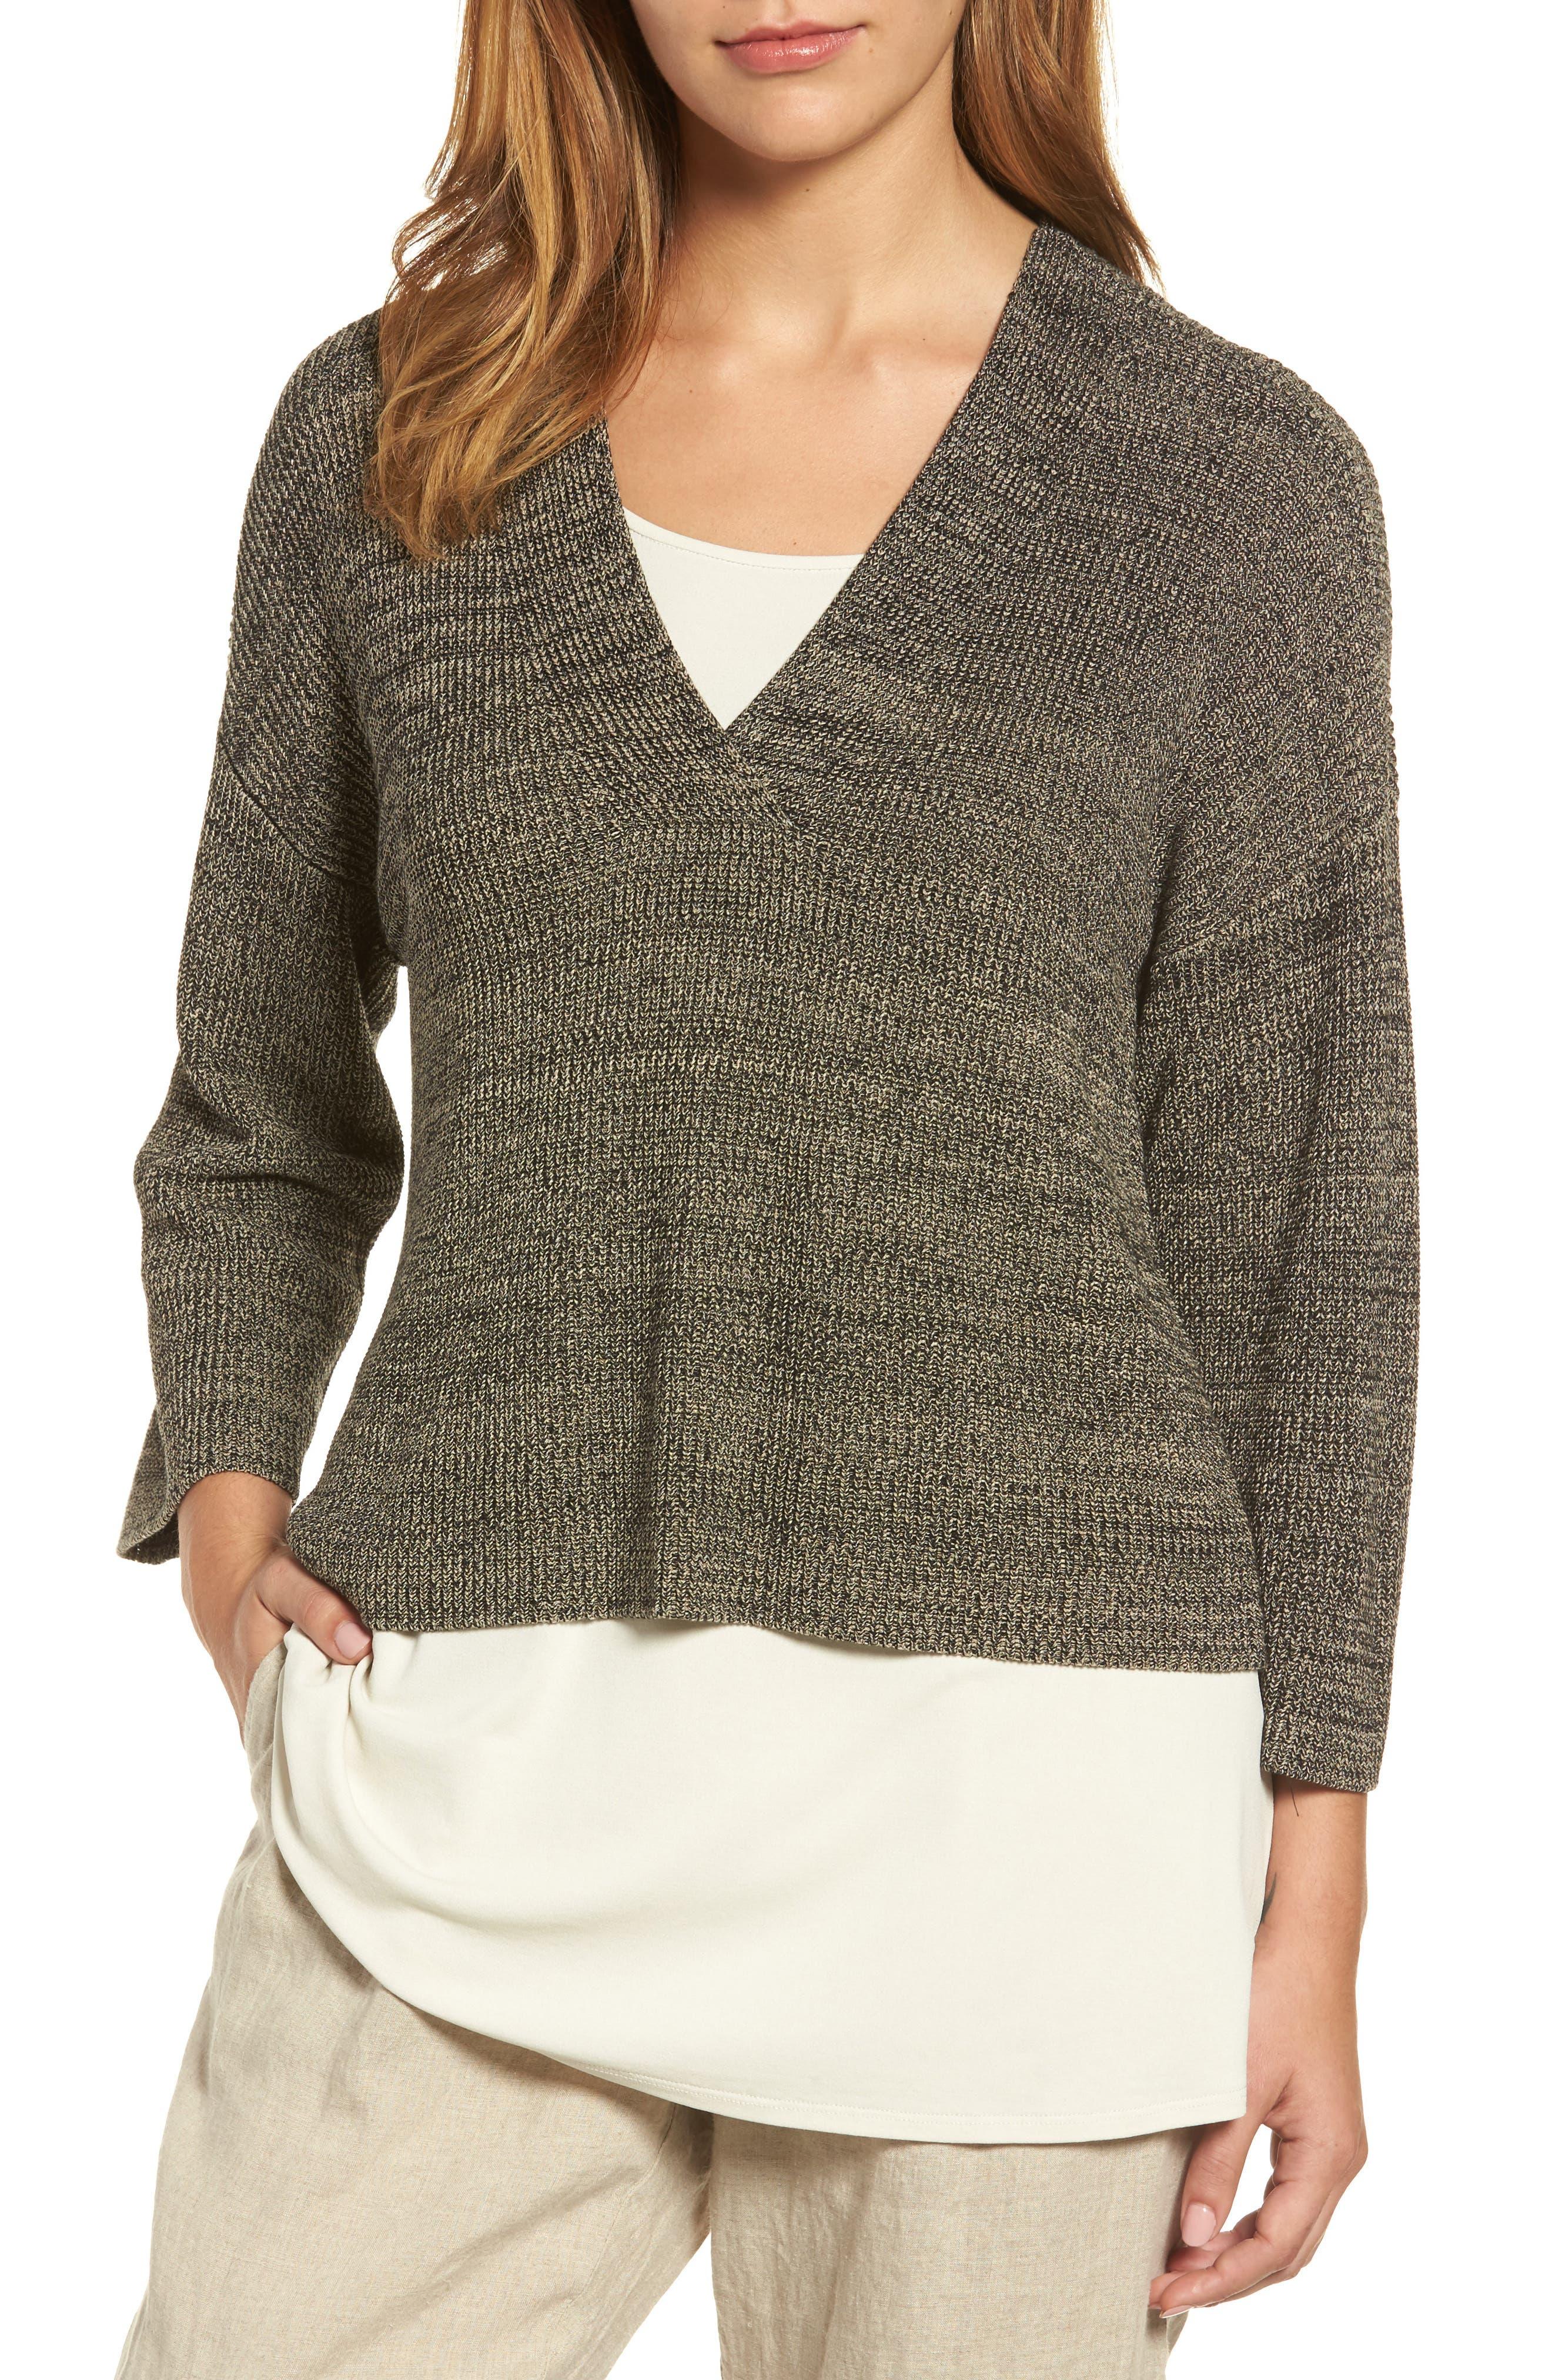 Mélange Knit Tencel<sup>®</sup> Crop Sweater,                             Main thumbnail 1, color,                             001